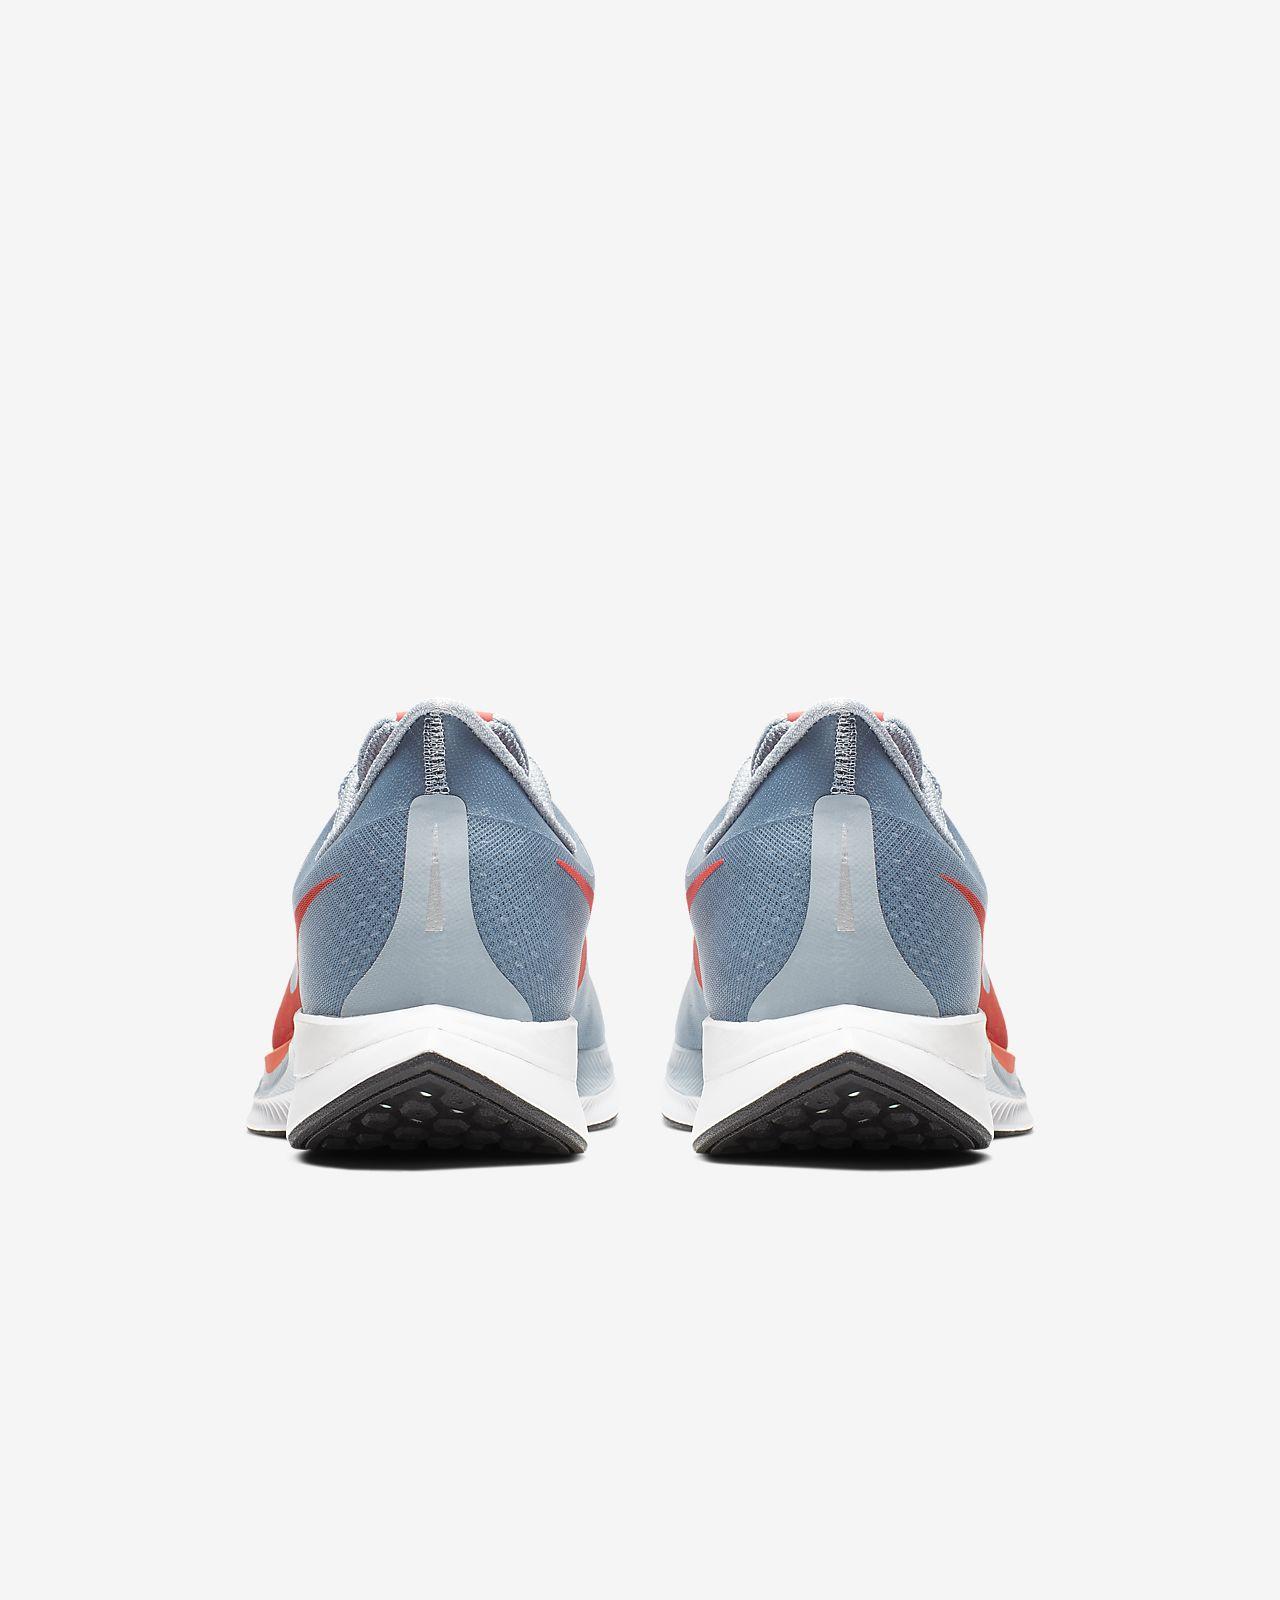 0612e328aed Nike Zoom Pegasus Turbo Men's Running Shoe. Nike.com AU